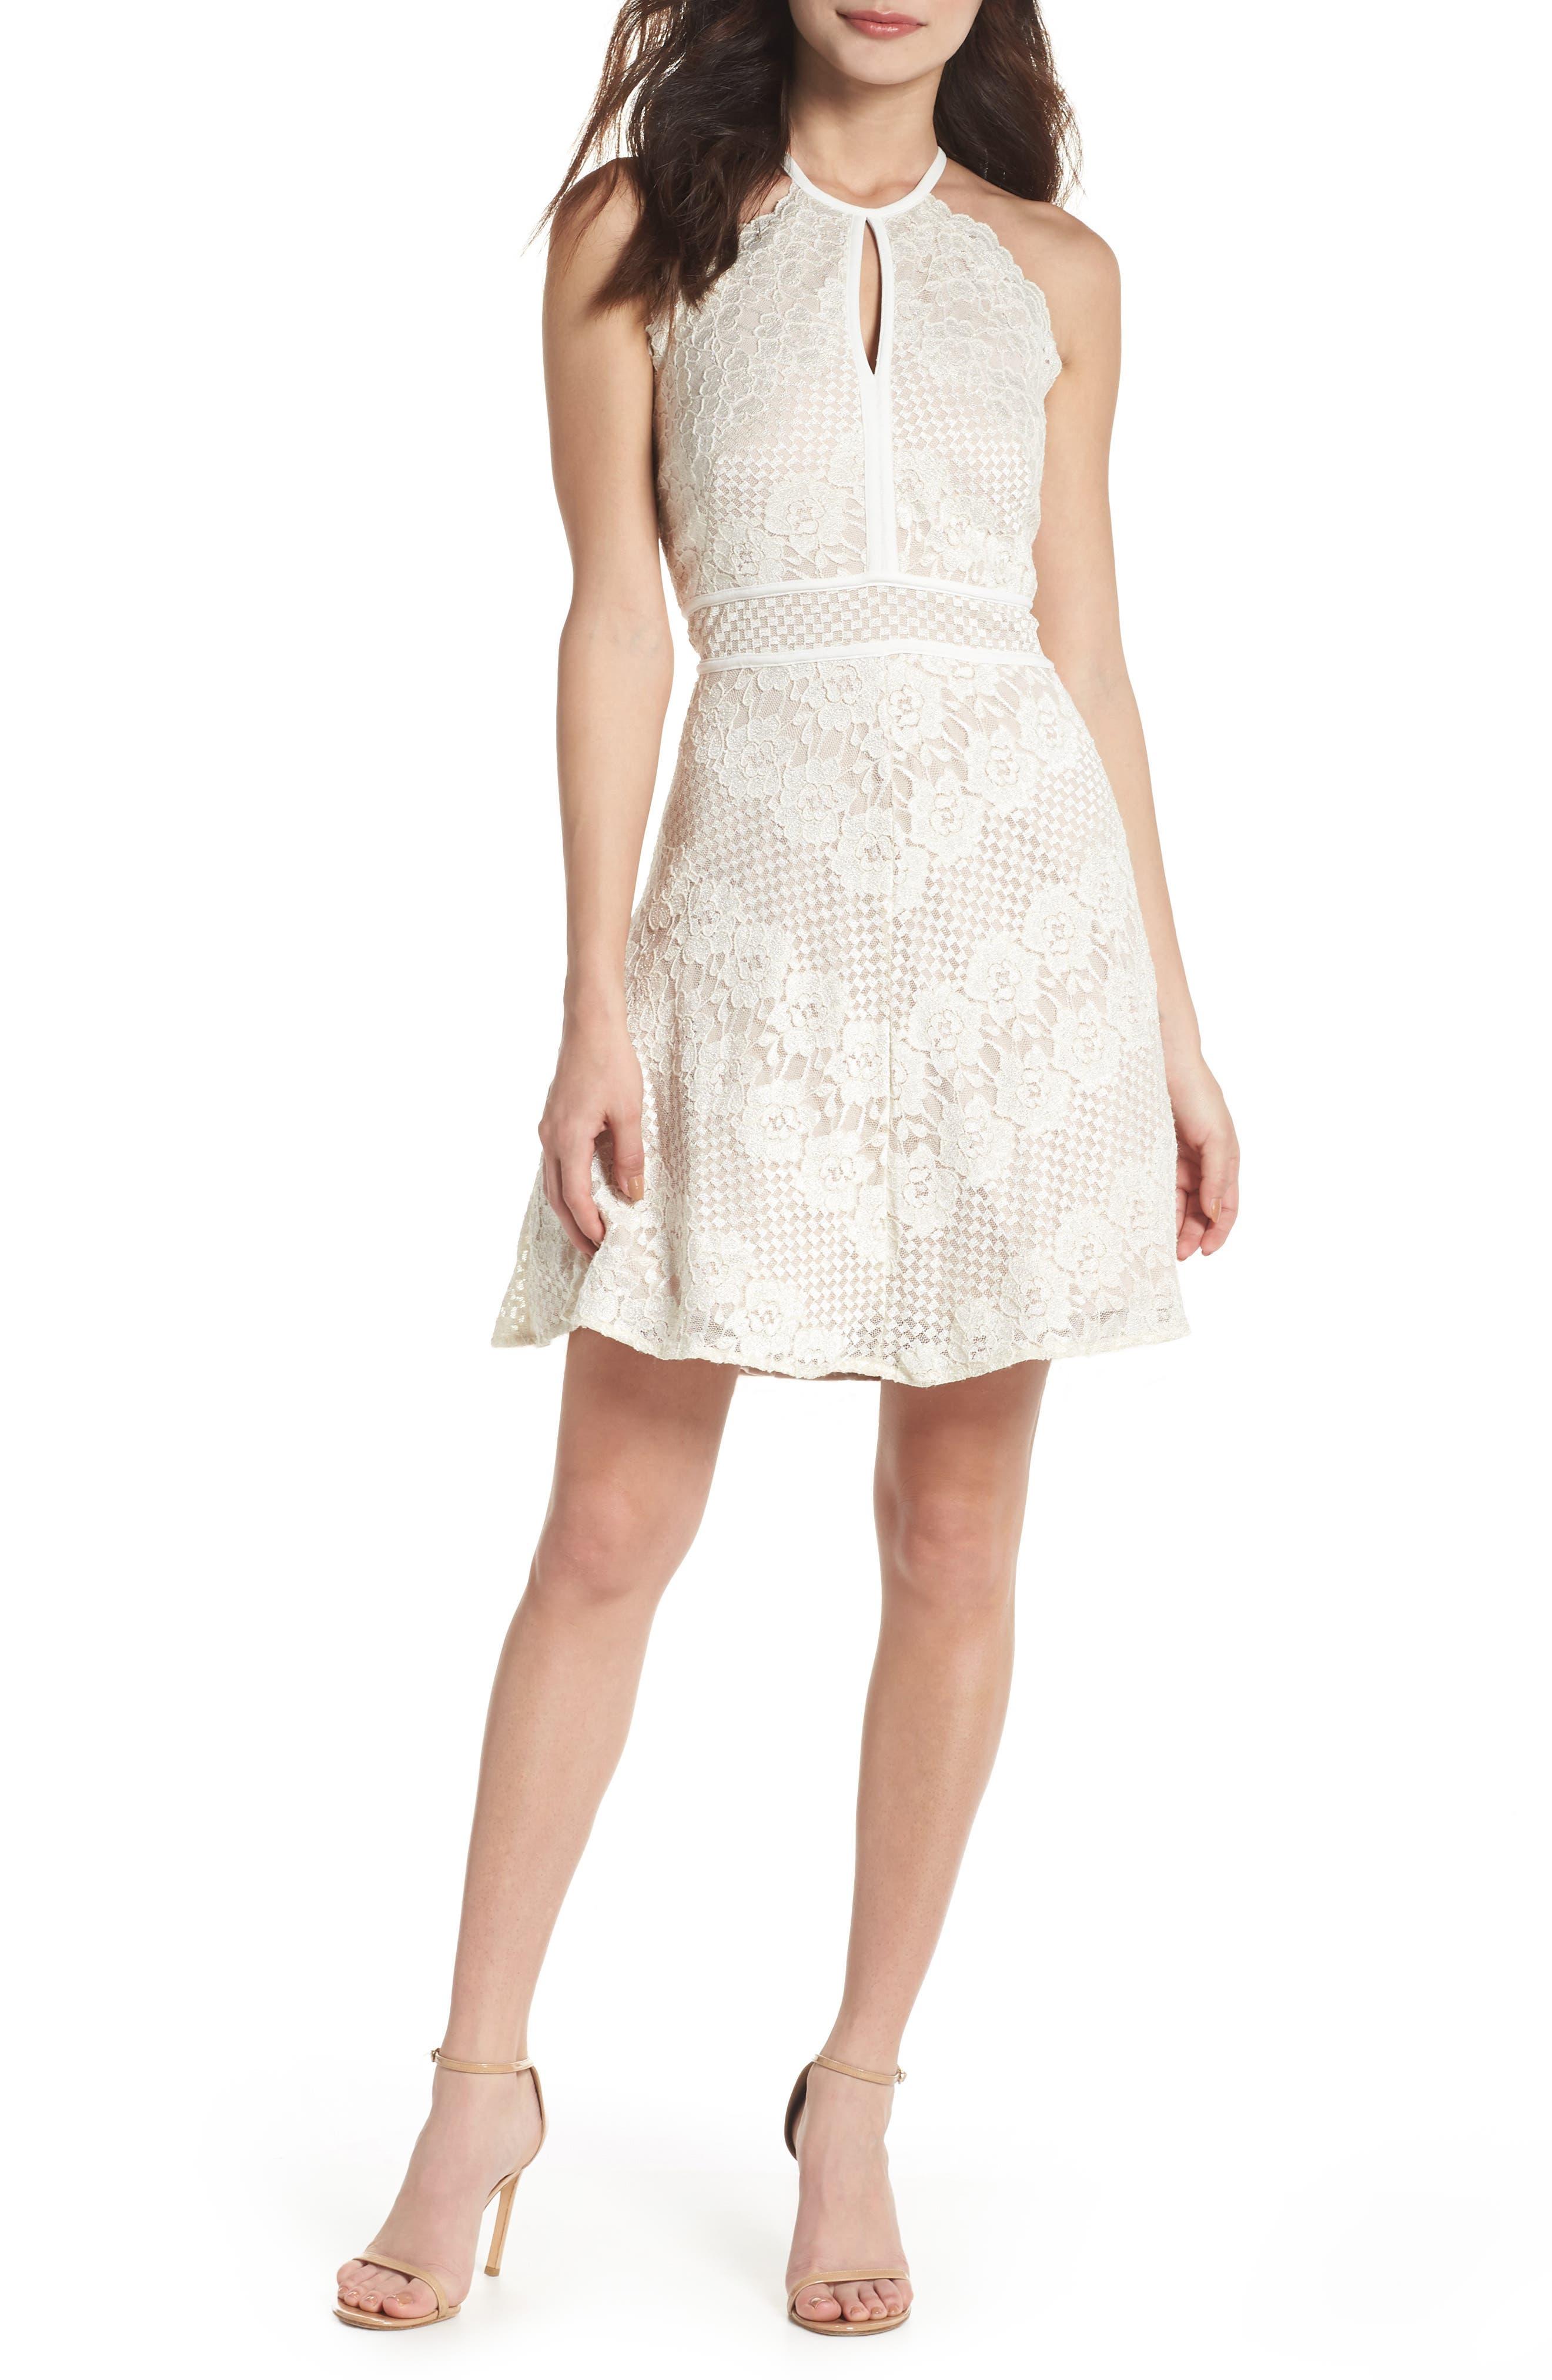 Alternate Image 1 Selected - Morgan & Co. Lace Halter Dress